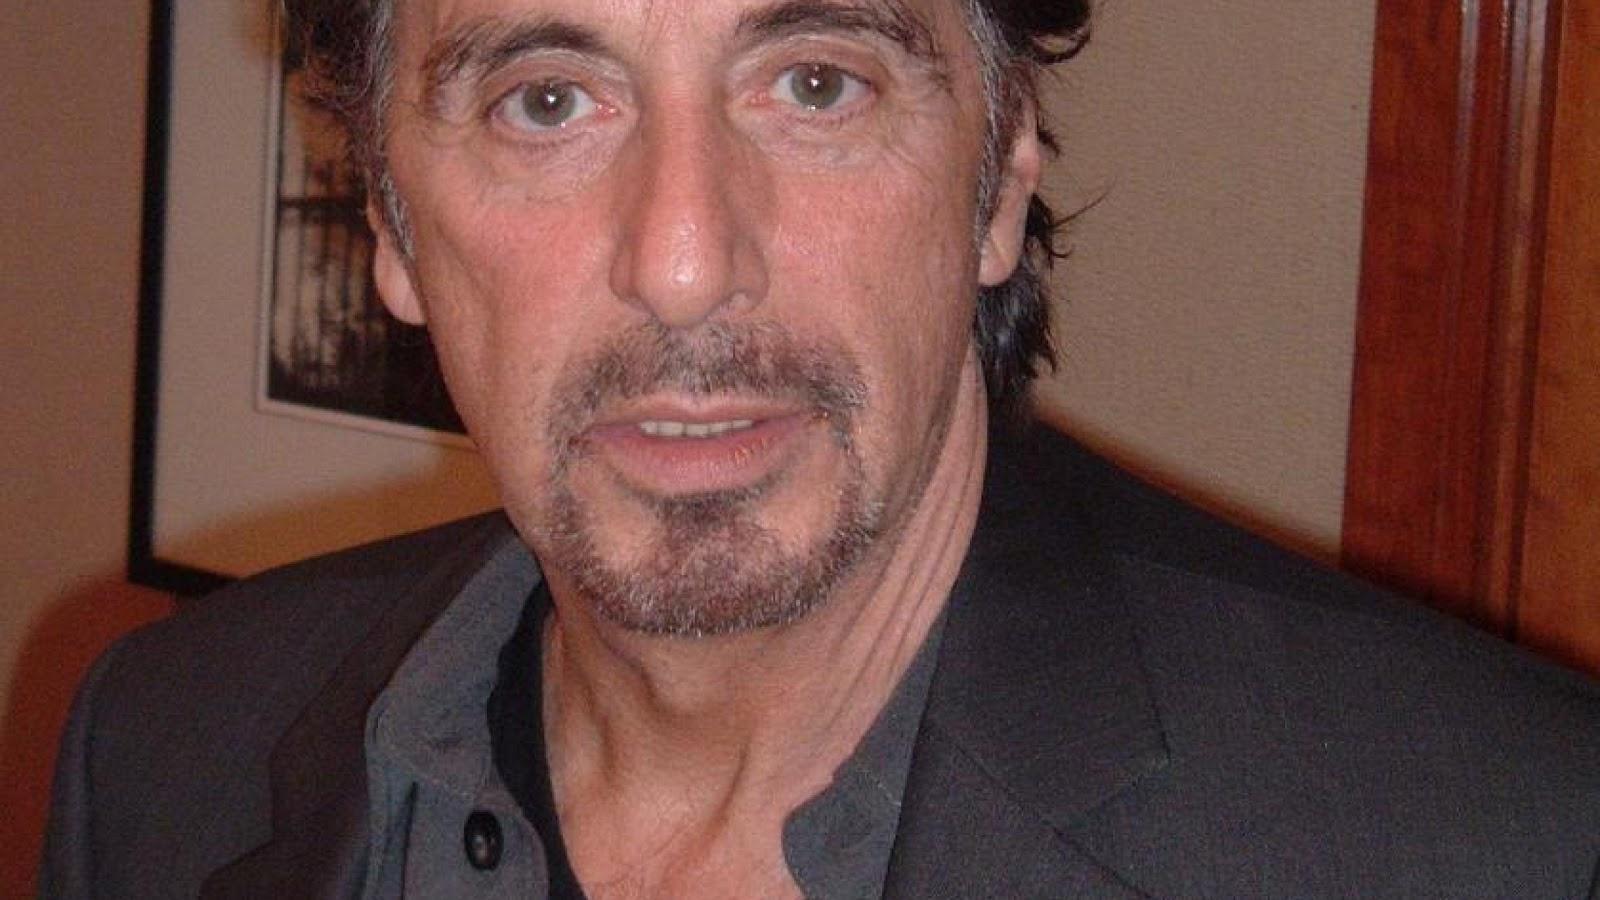 http://4.bp.blogspot.com/-Zn0Zc5Ol8_I/UM8AqVVrPGI/AAAAAAAAJZk/ShLVfSVX5eM/s1600/Al+Pacino-Wallpaper-5.jpg